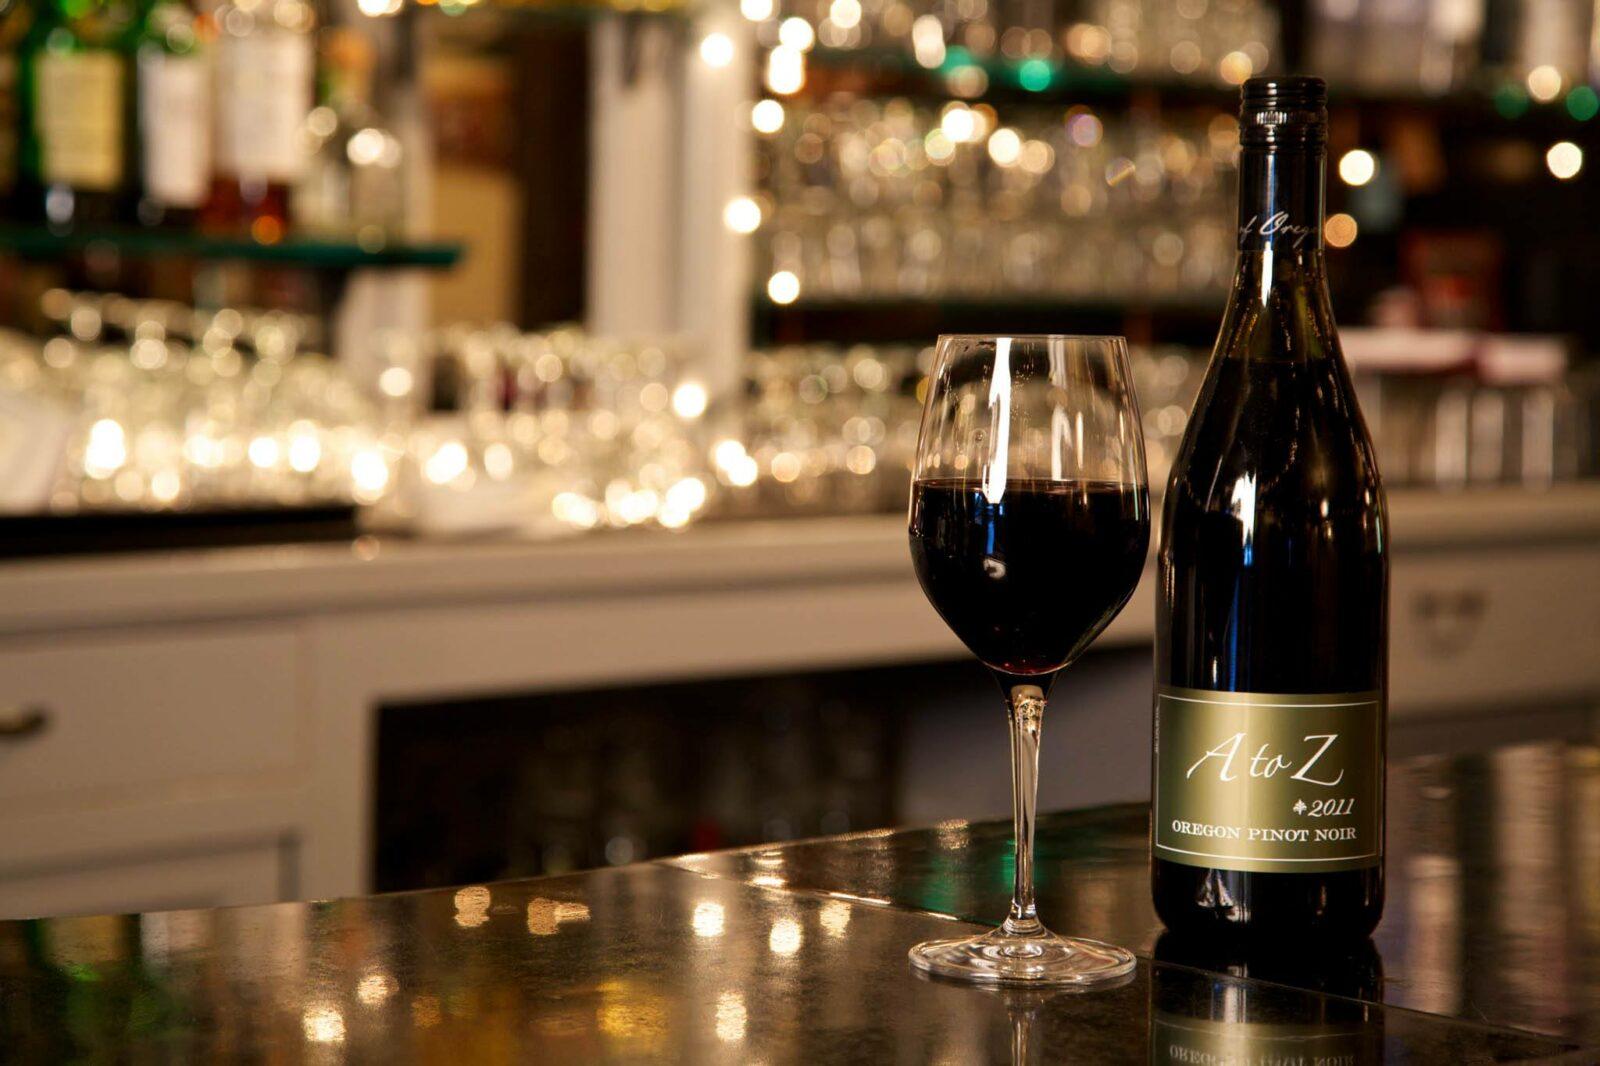 Cannon Beach Wine List